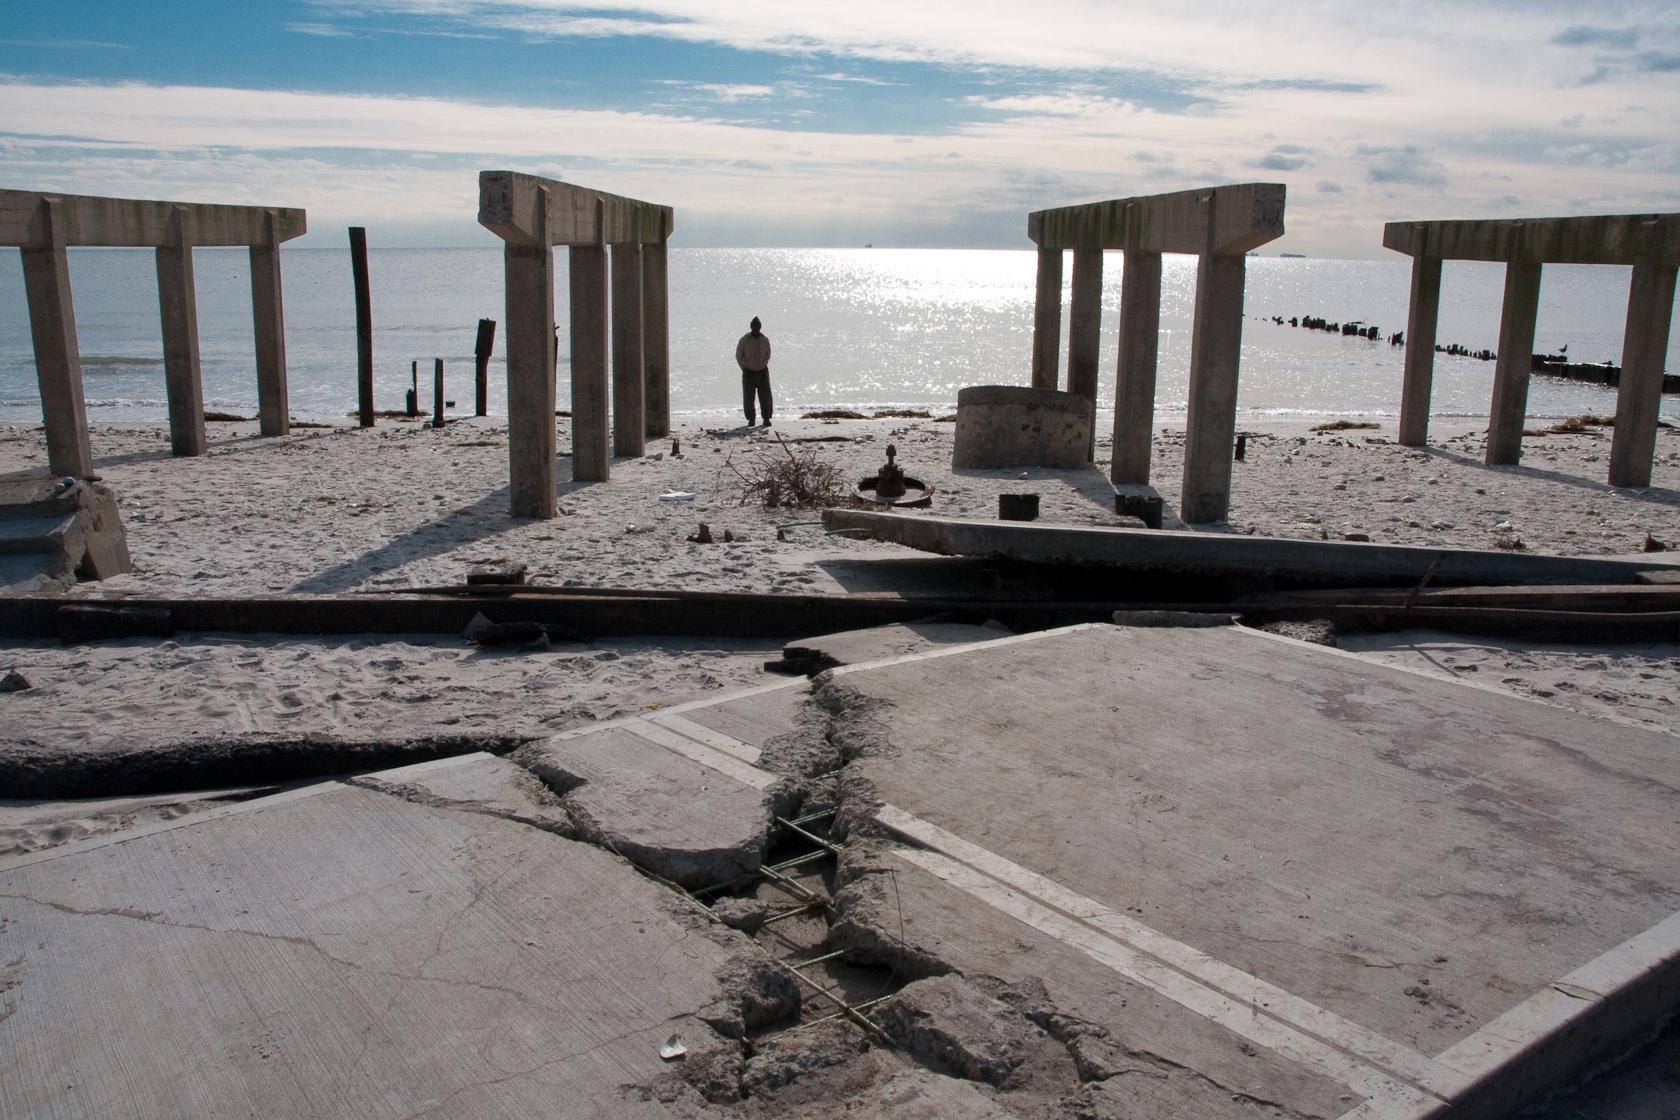 Hurricane Sandy, The Far Rockaways, NY 